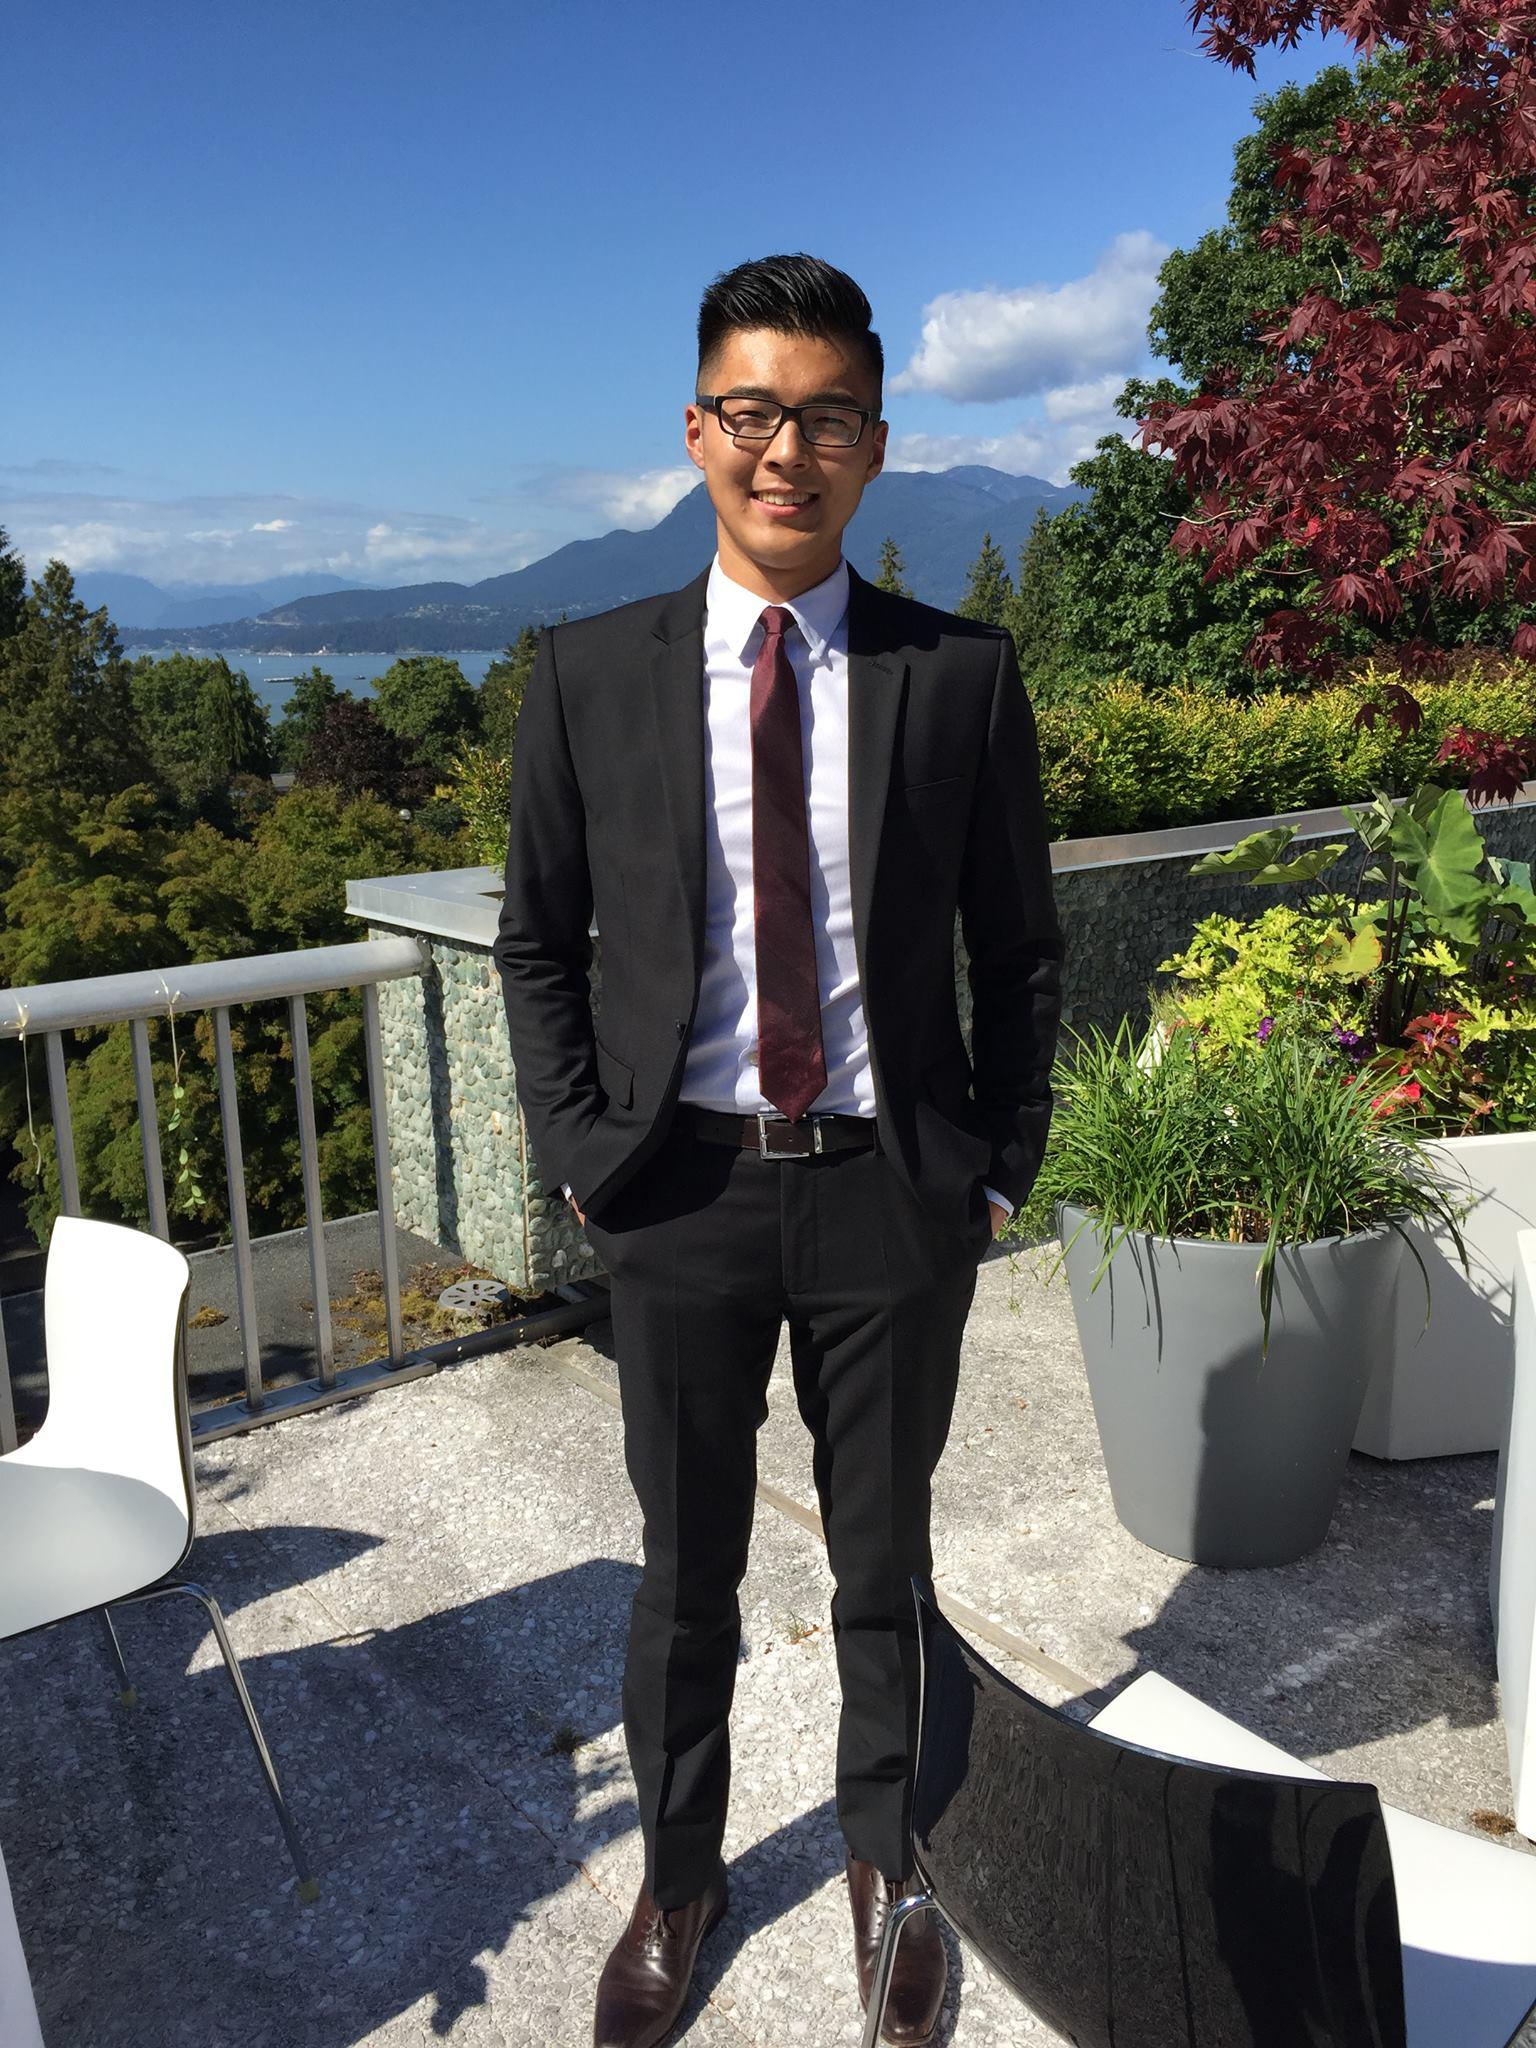 Joel Xu Profile Picture.jpg